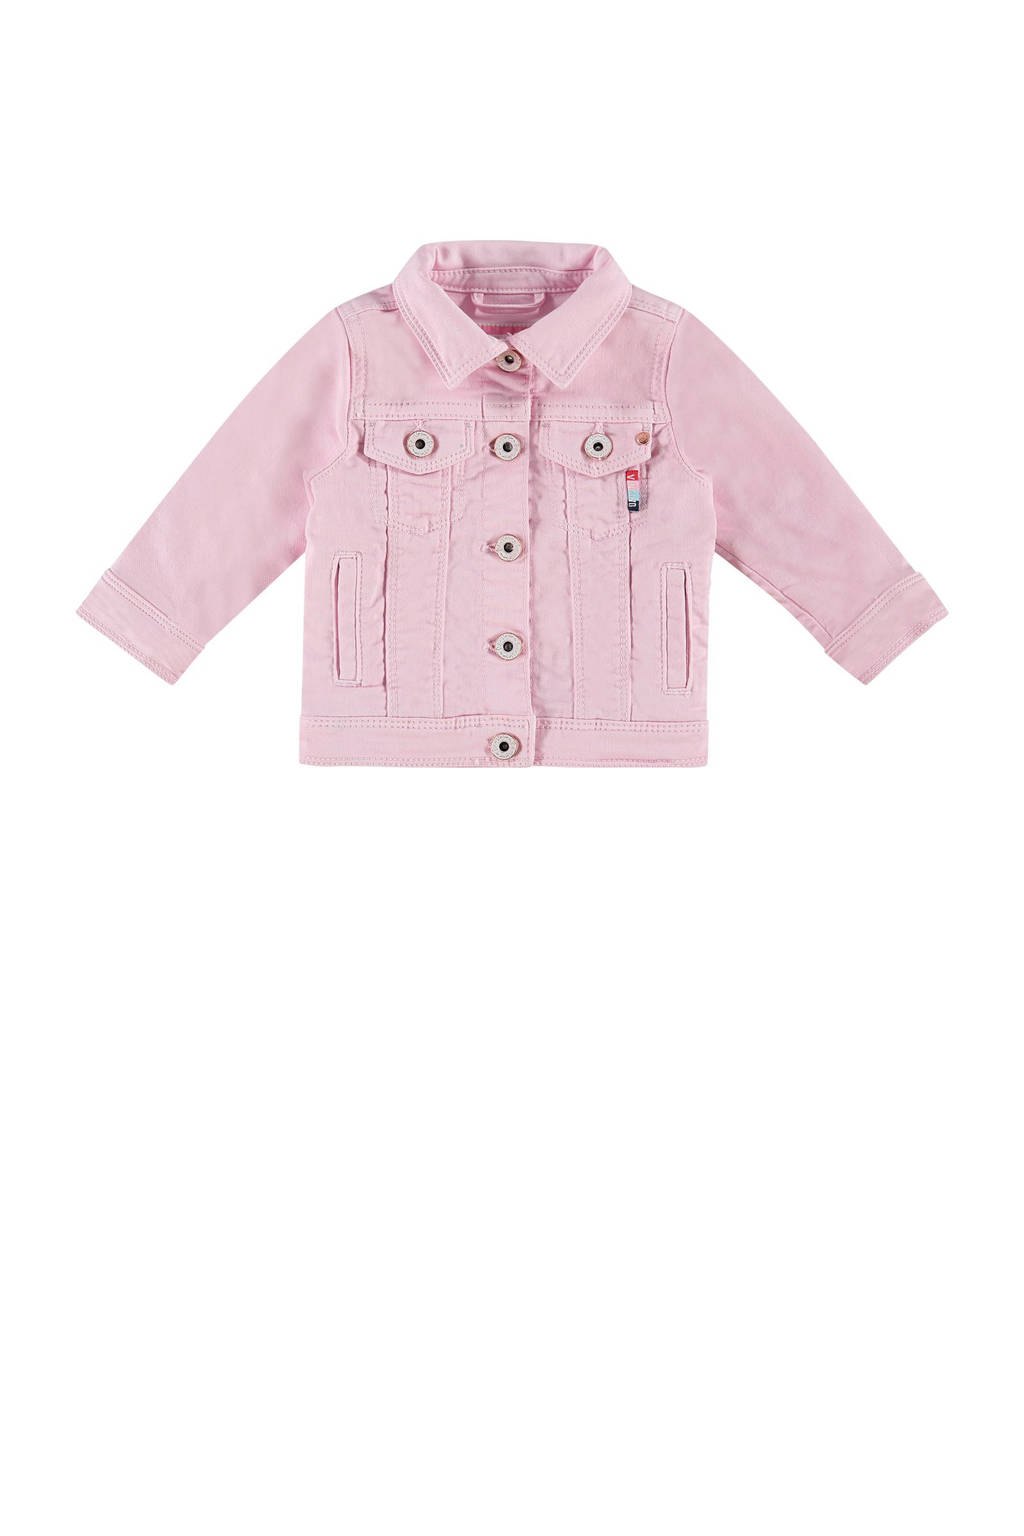 Vingino spijkerjas Telly roze, Roze